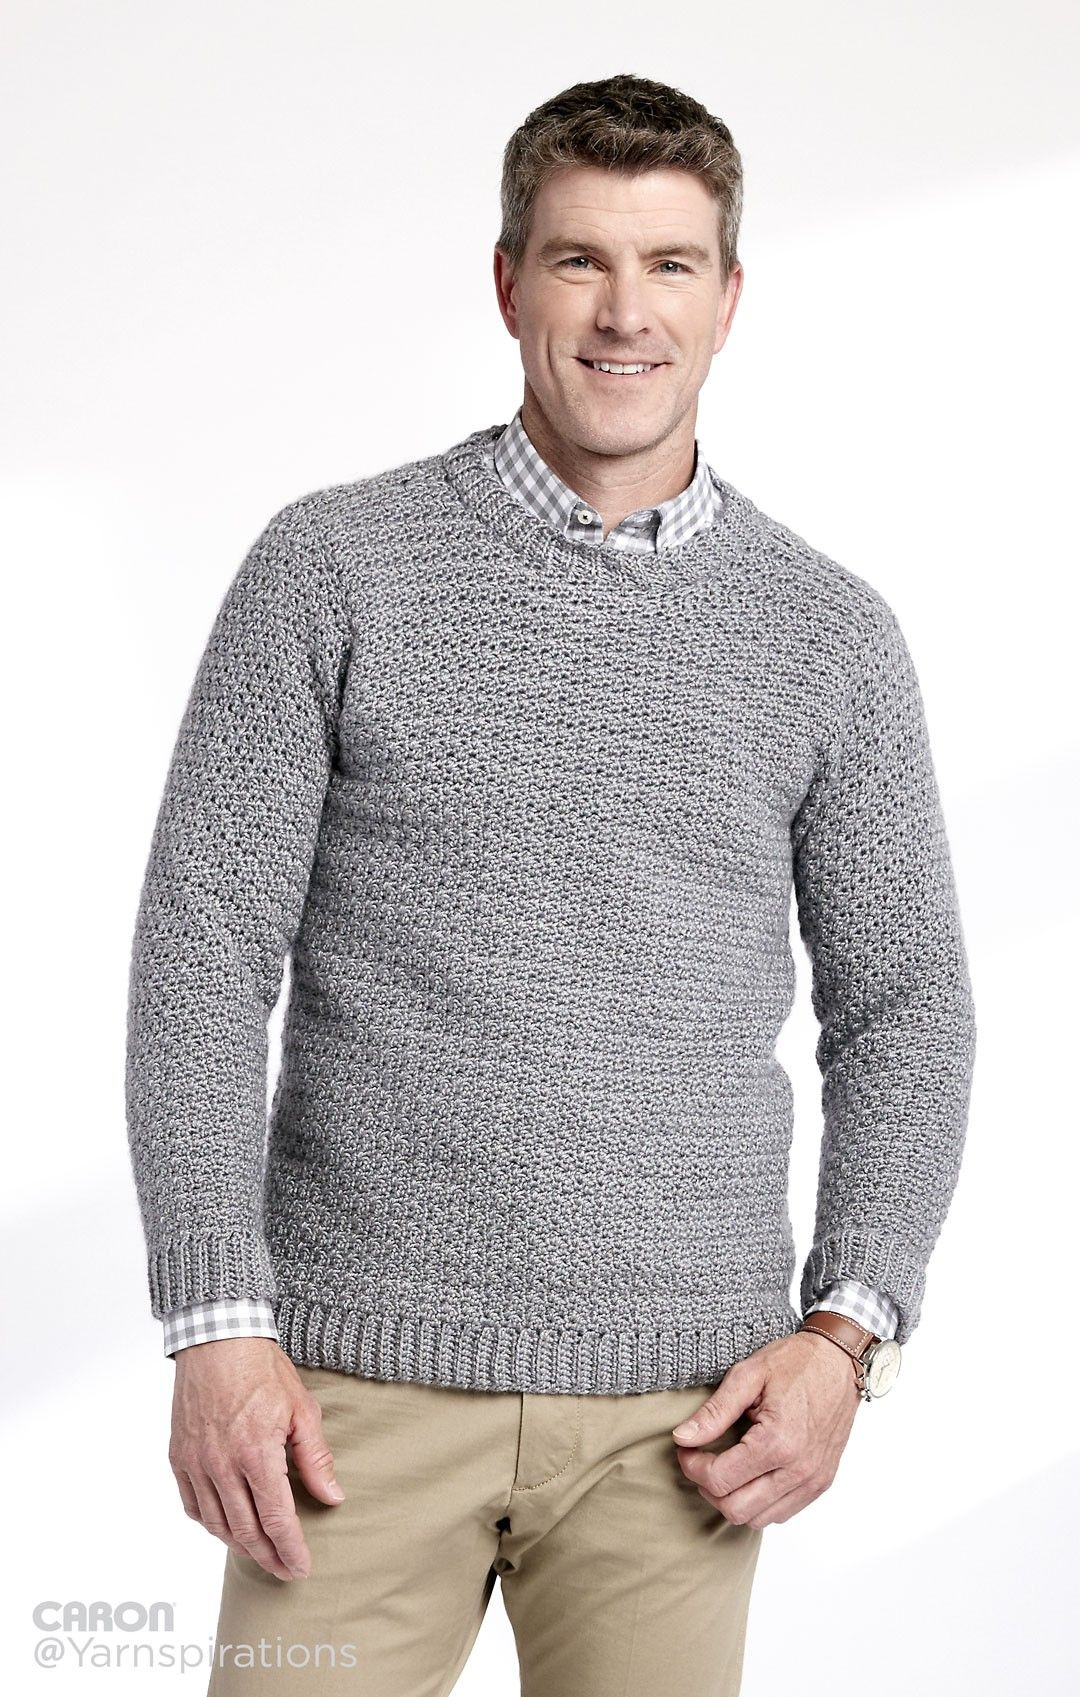 Adult Crochet Crew Neck Pullover - Patterns   Yarnspirations ...